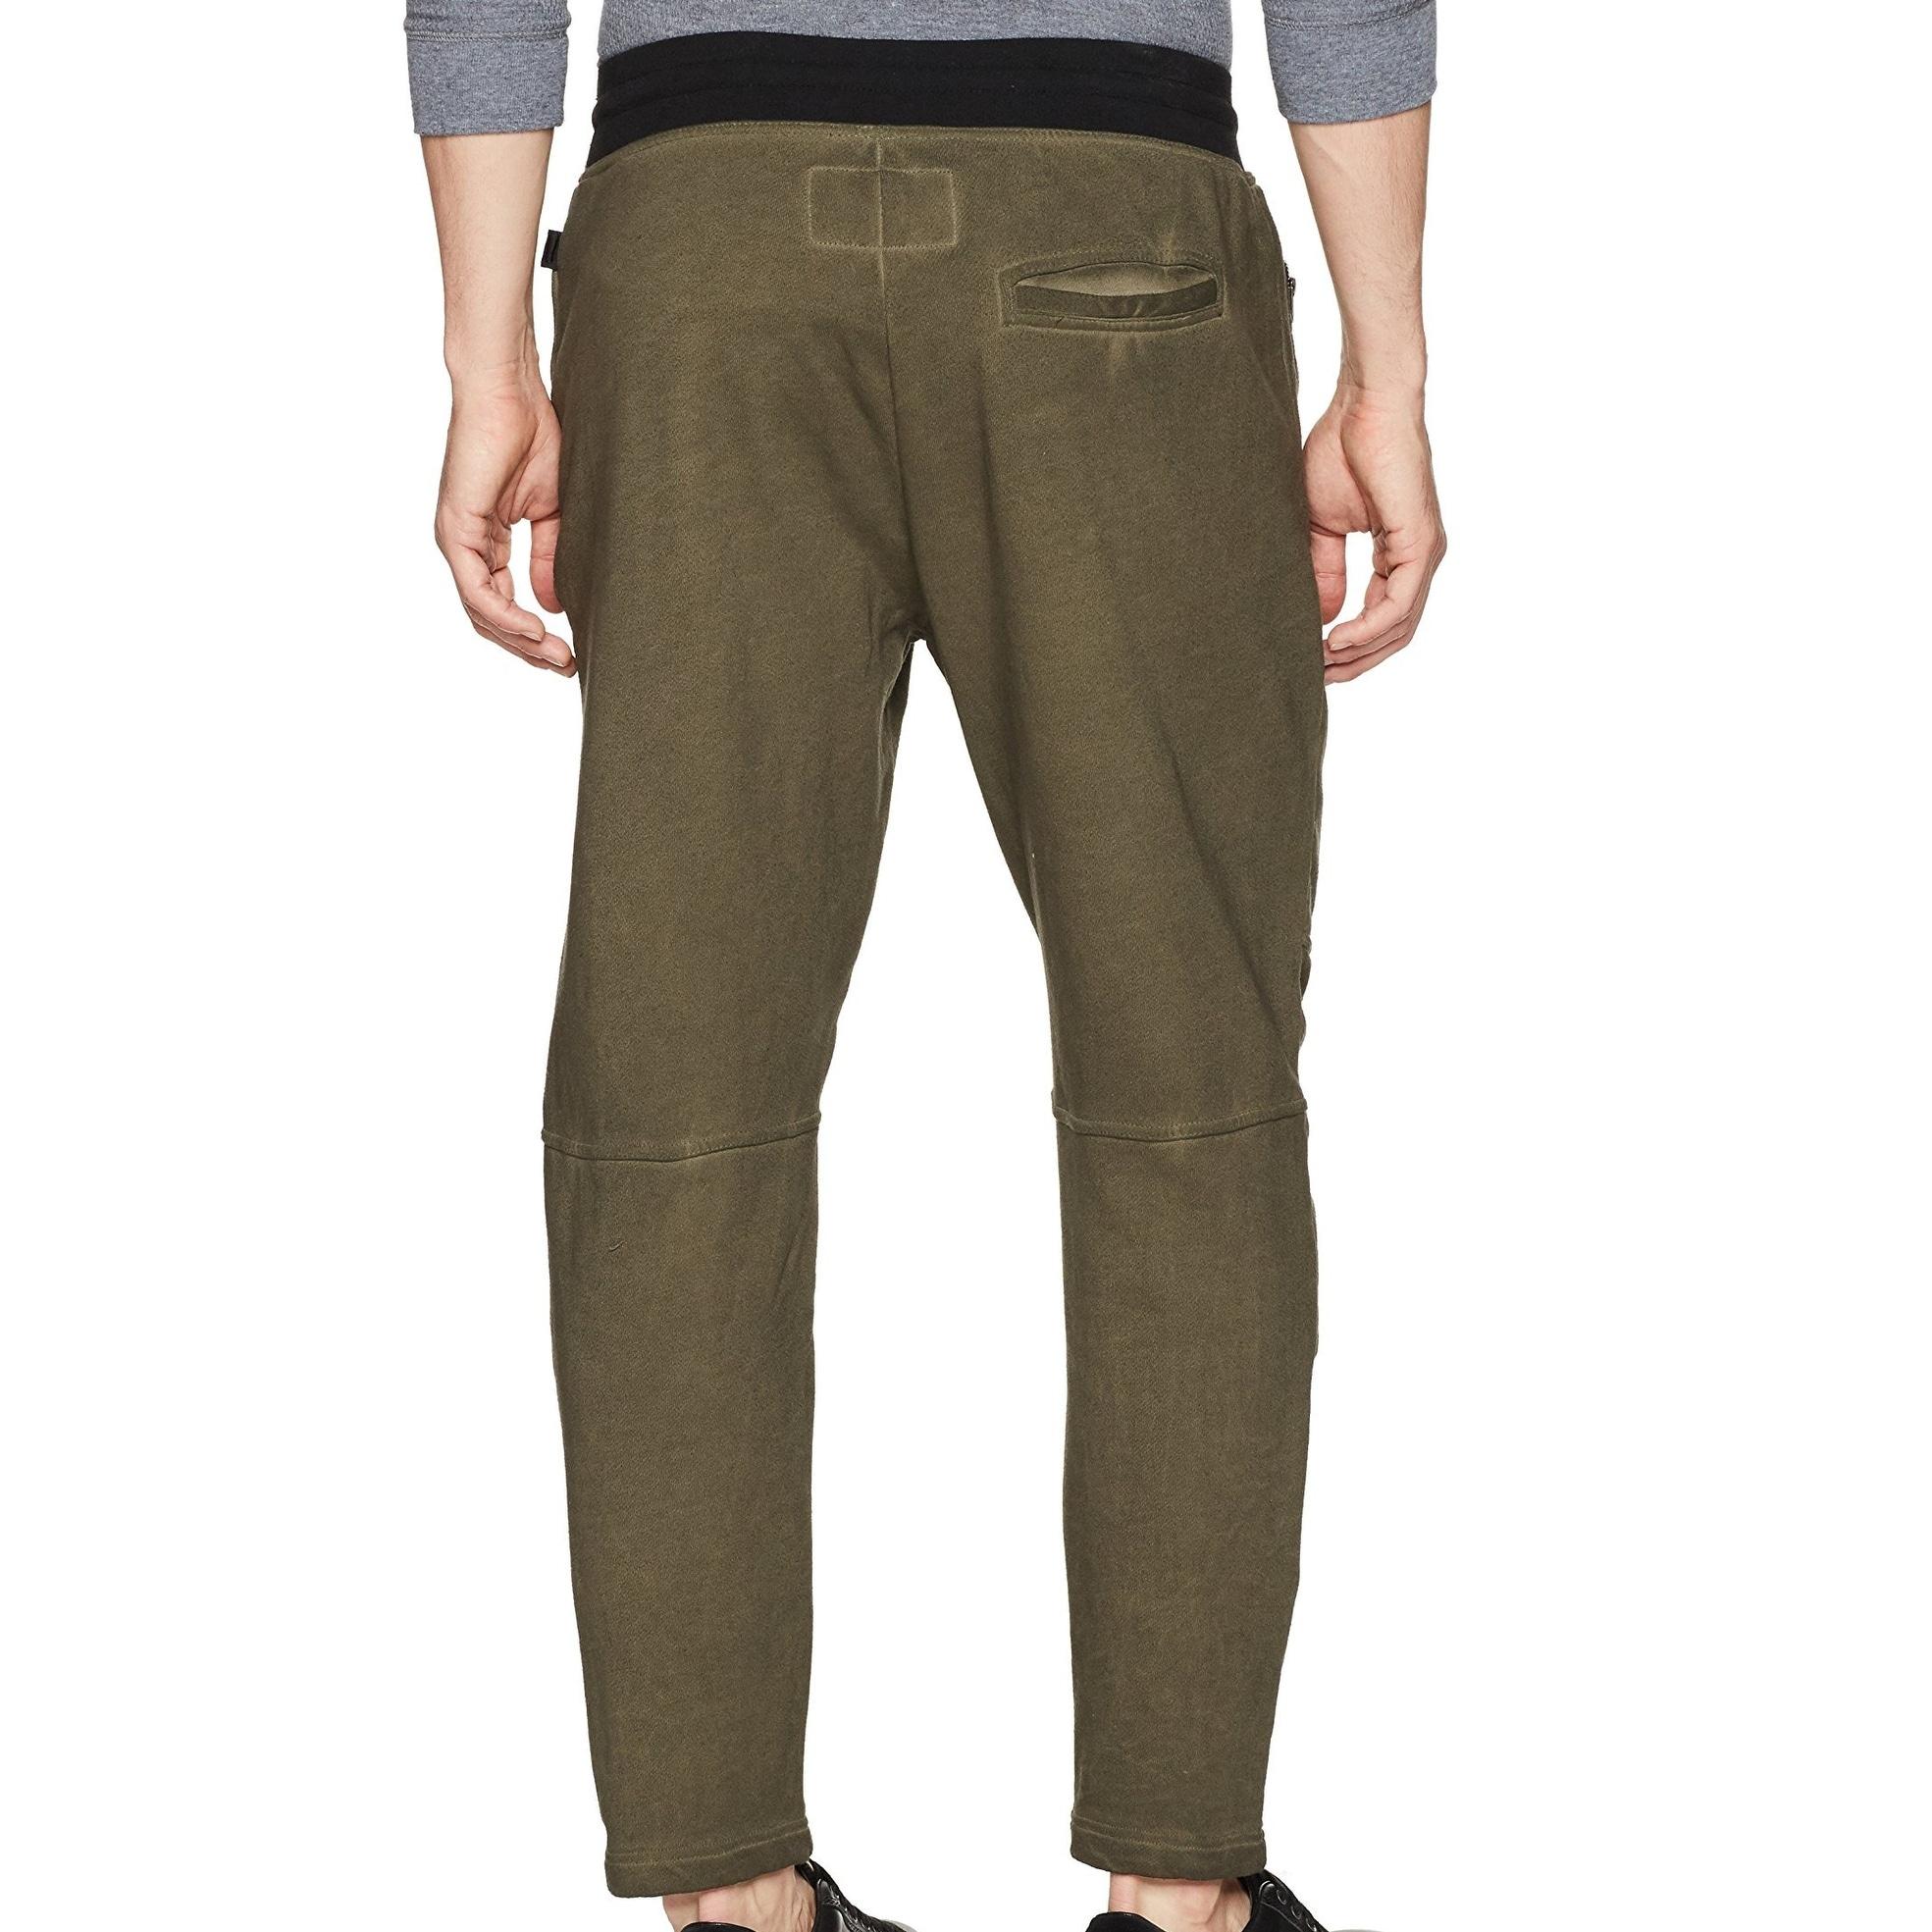 Eslove Fashion Men Baggy Pants 7XL Men Trousers Solid Color Elastic Casual Pants Extra BigRed Blue Black Gray